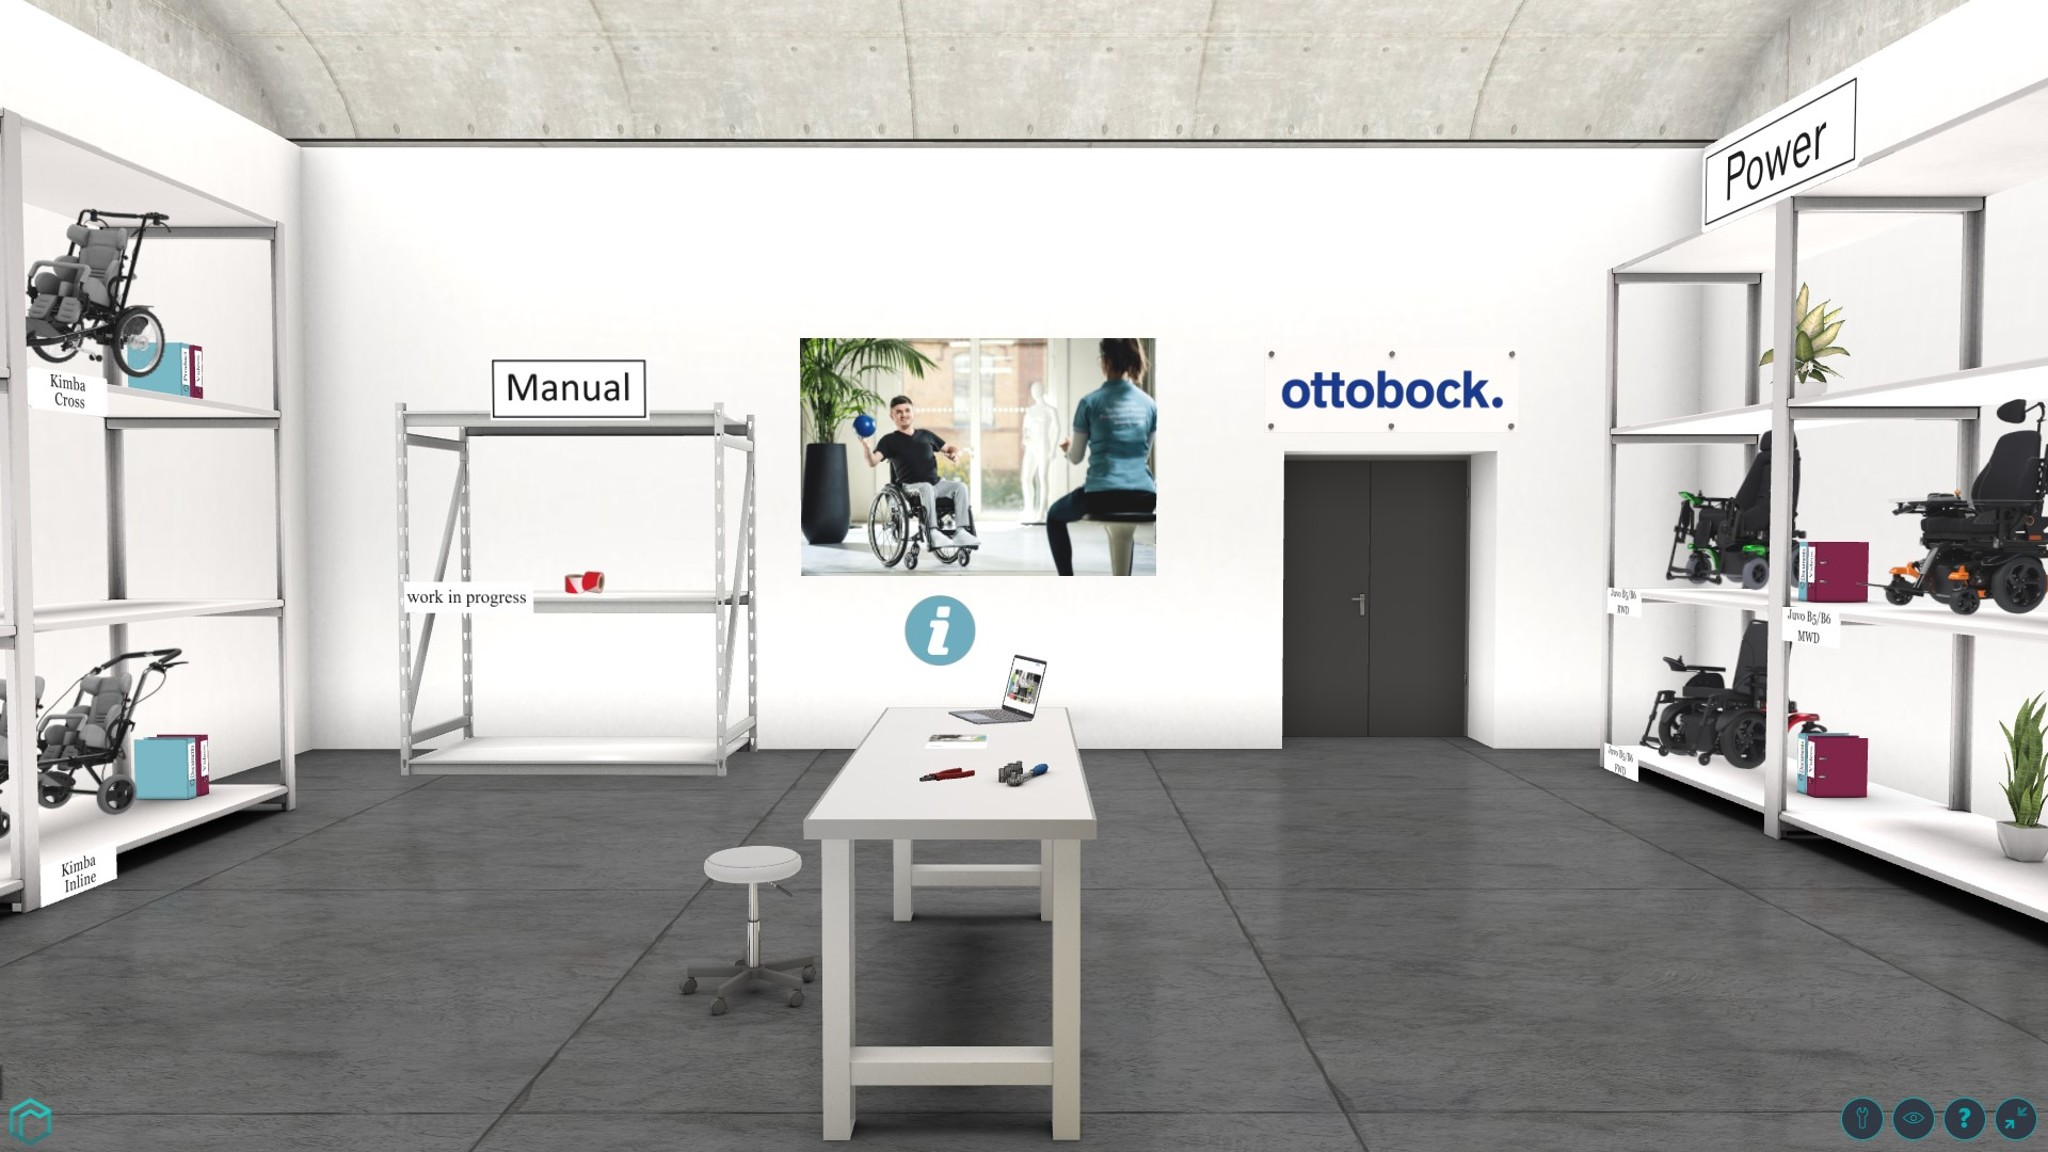 View of Ottobock's virtual workshop room